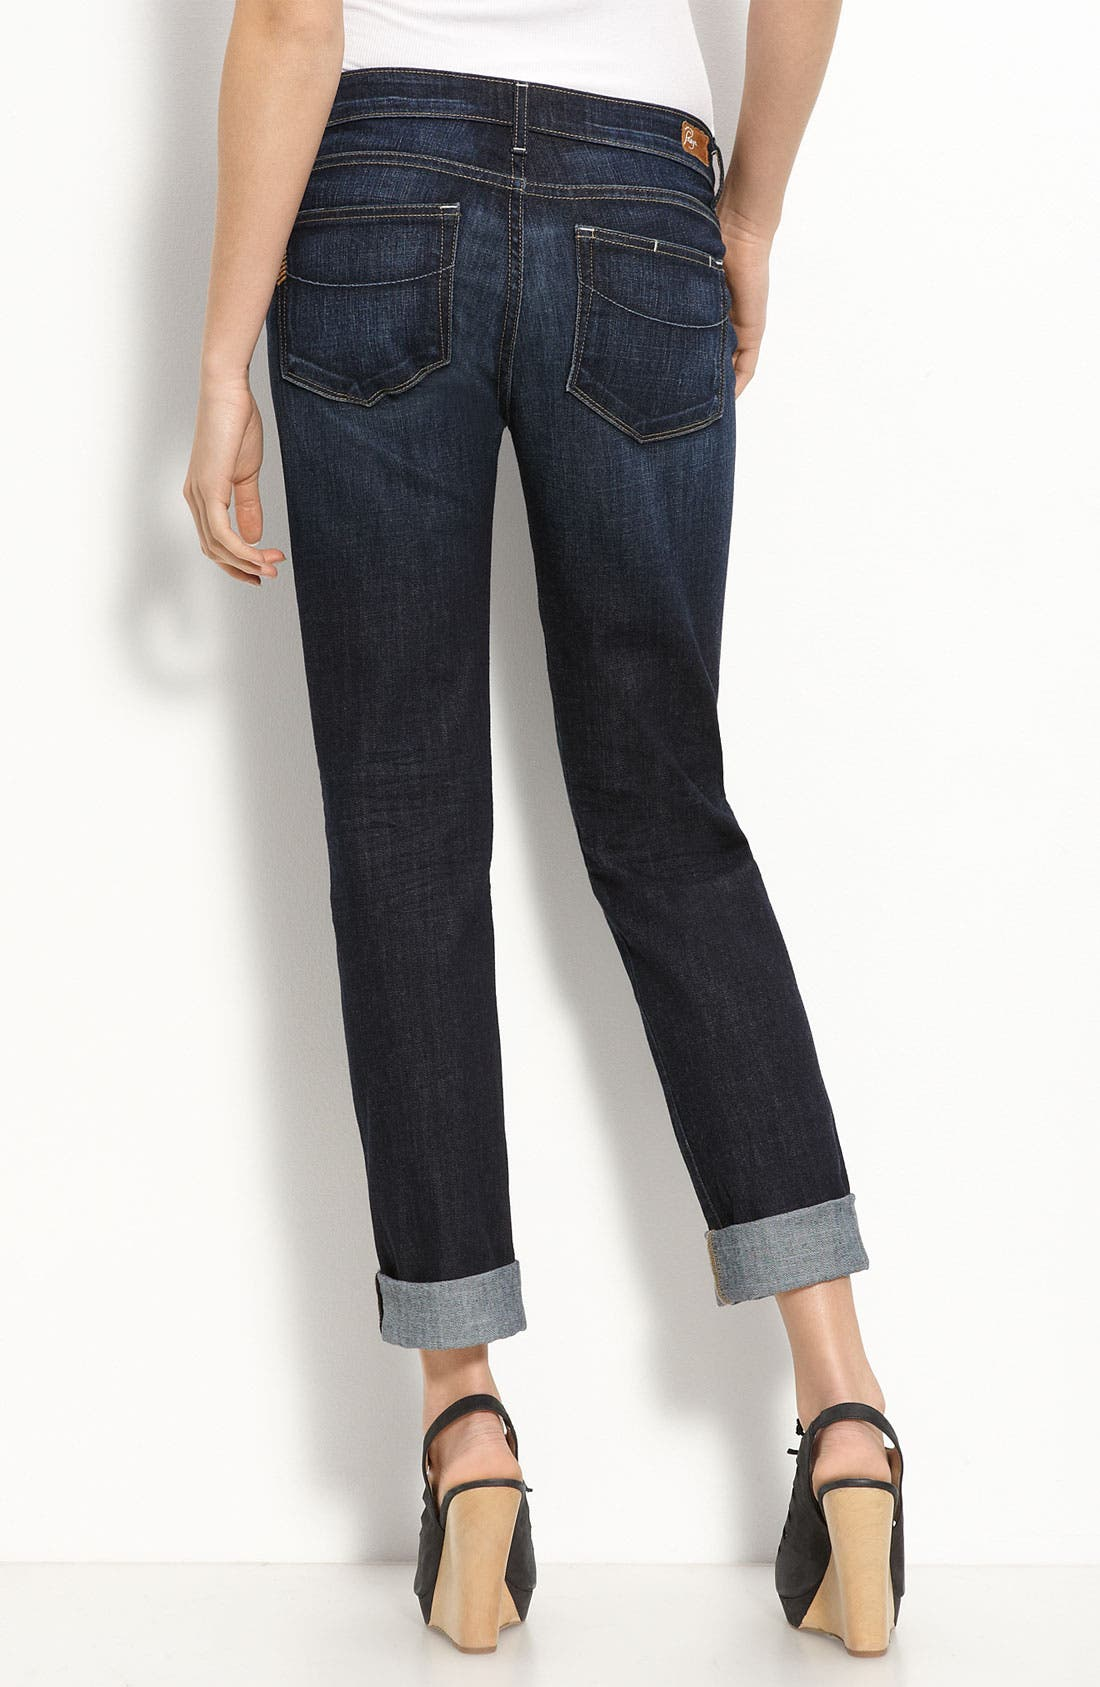 PAIGE, Denim 'Jimmy Jimmy' Stretch Jeans, Alternate thumbnail 2, color, 410